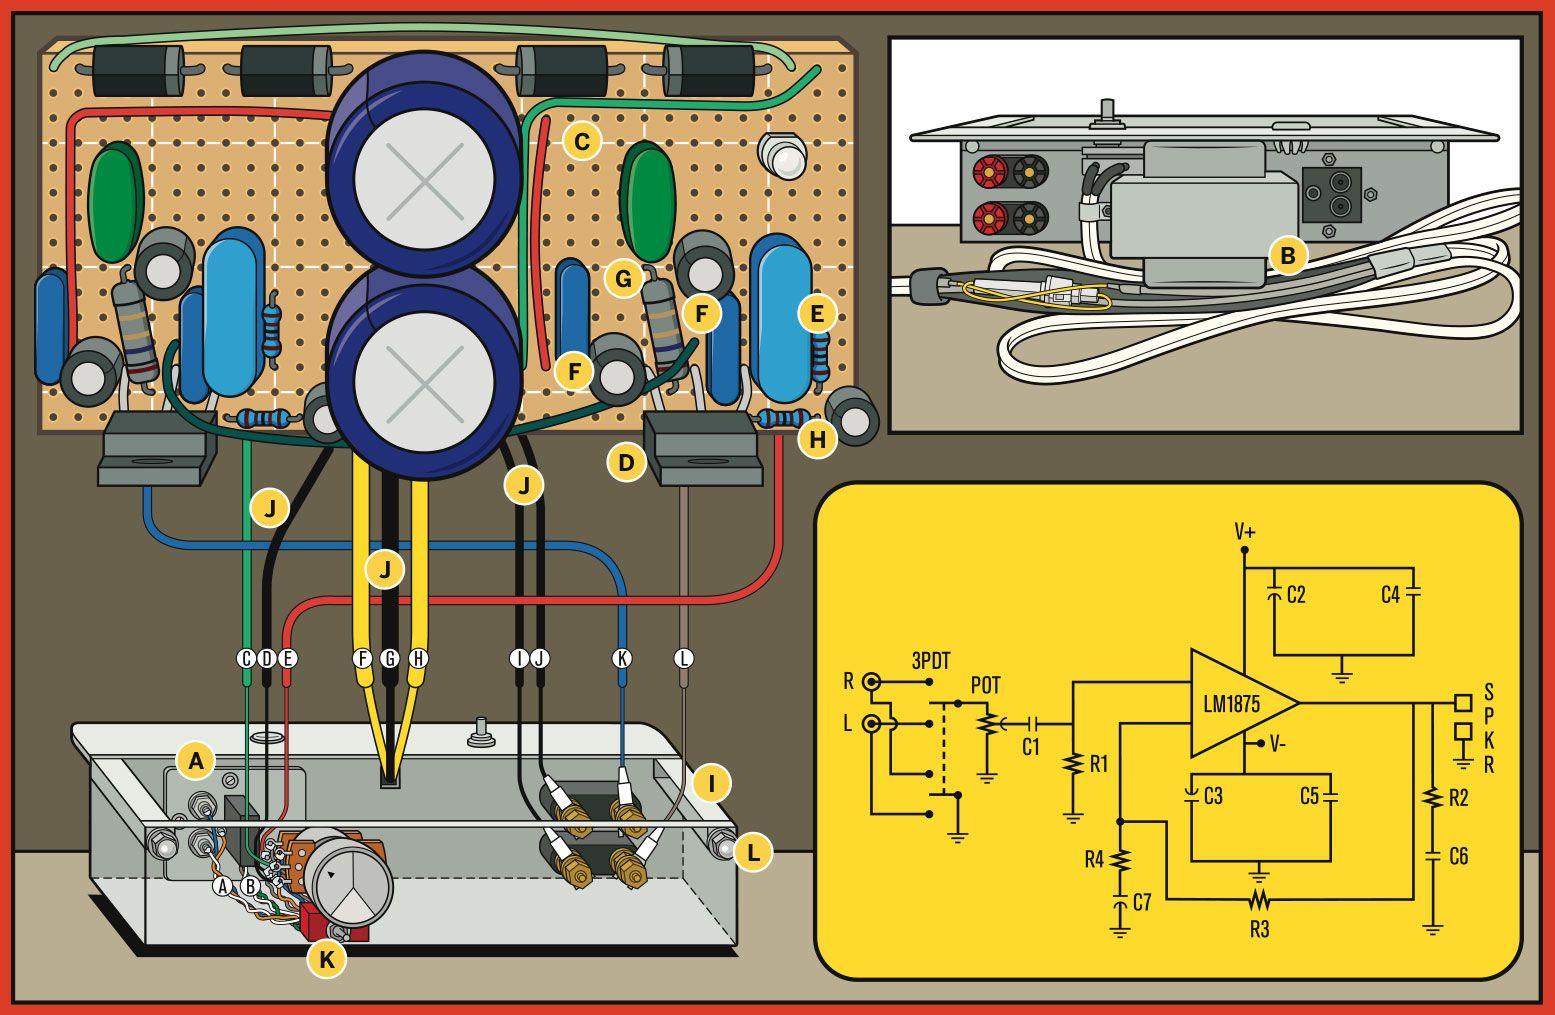 Build A Bare Bones Skeleton Amplifier Music Bone Water Level Indicator Circuit Gadgetronicx